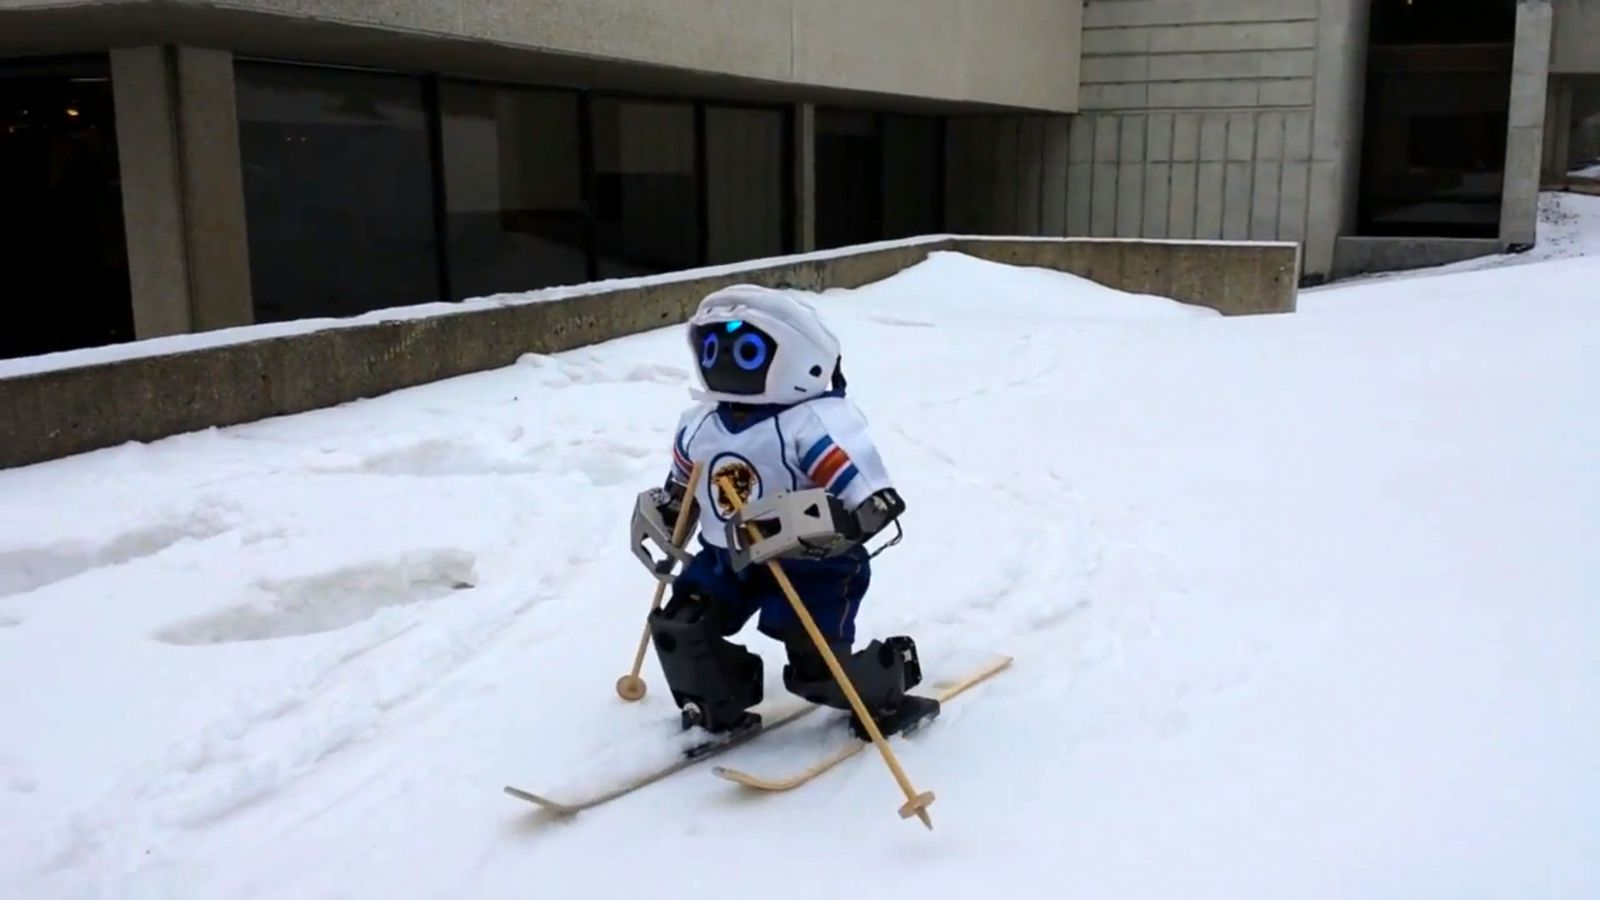 NUR ALS ZITAT Screenshot Ski Roboter